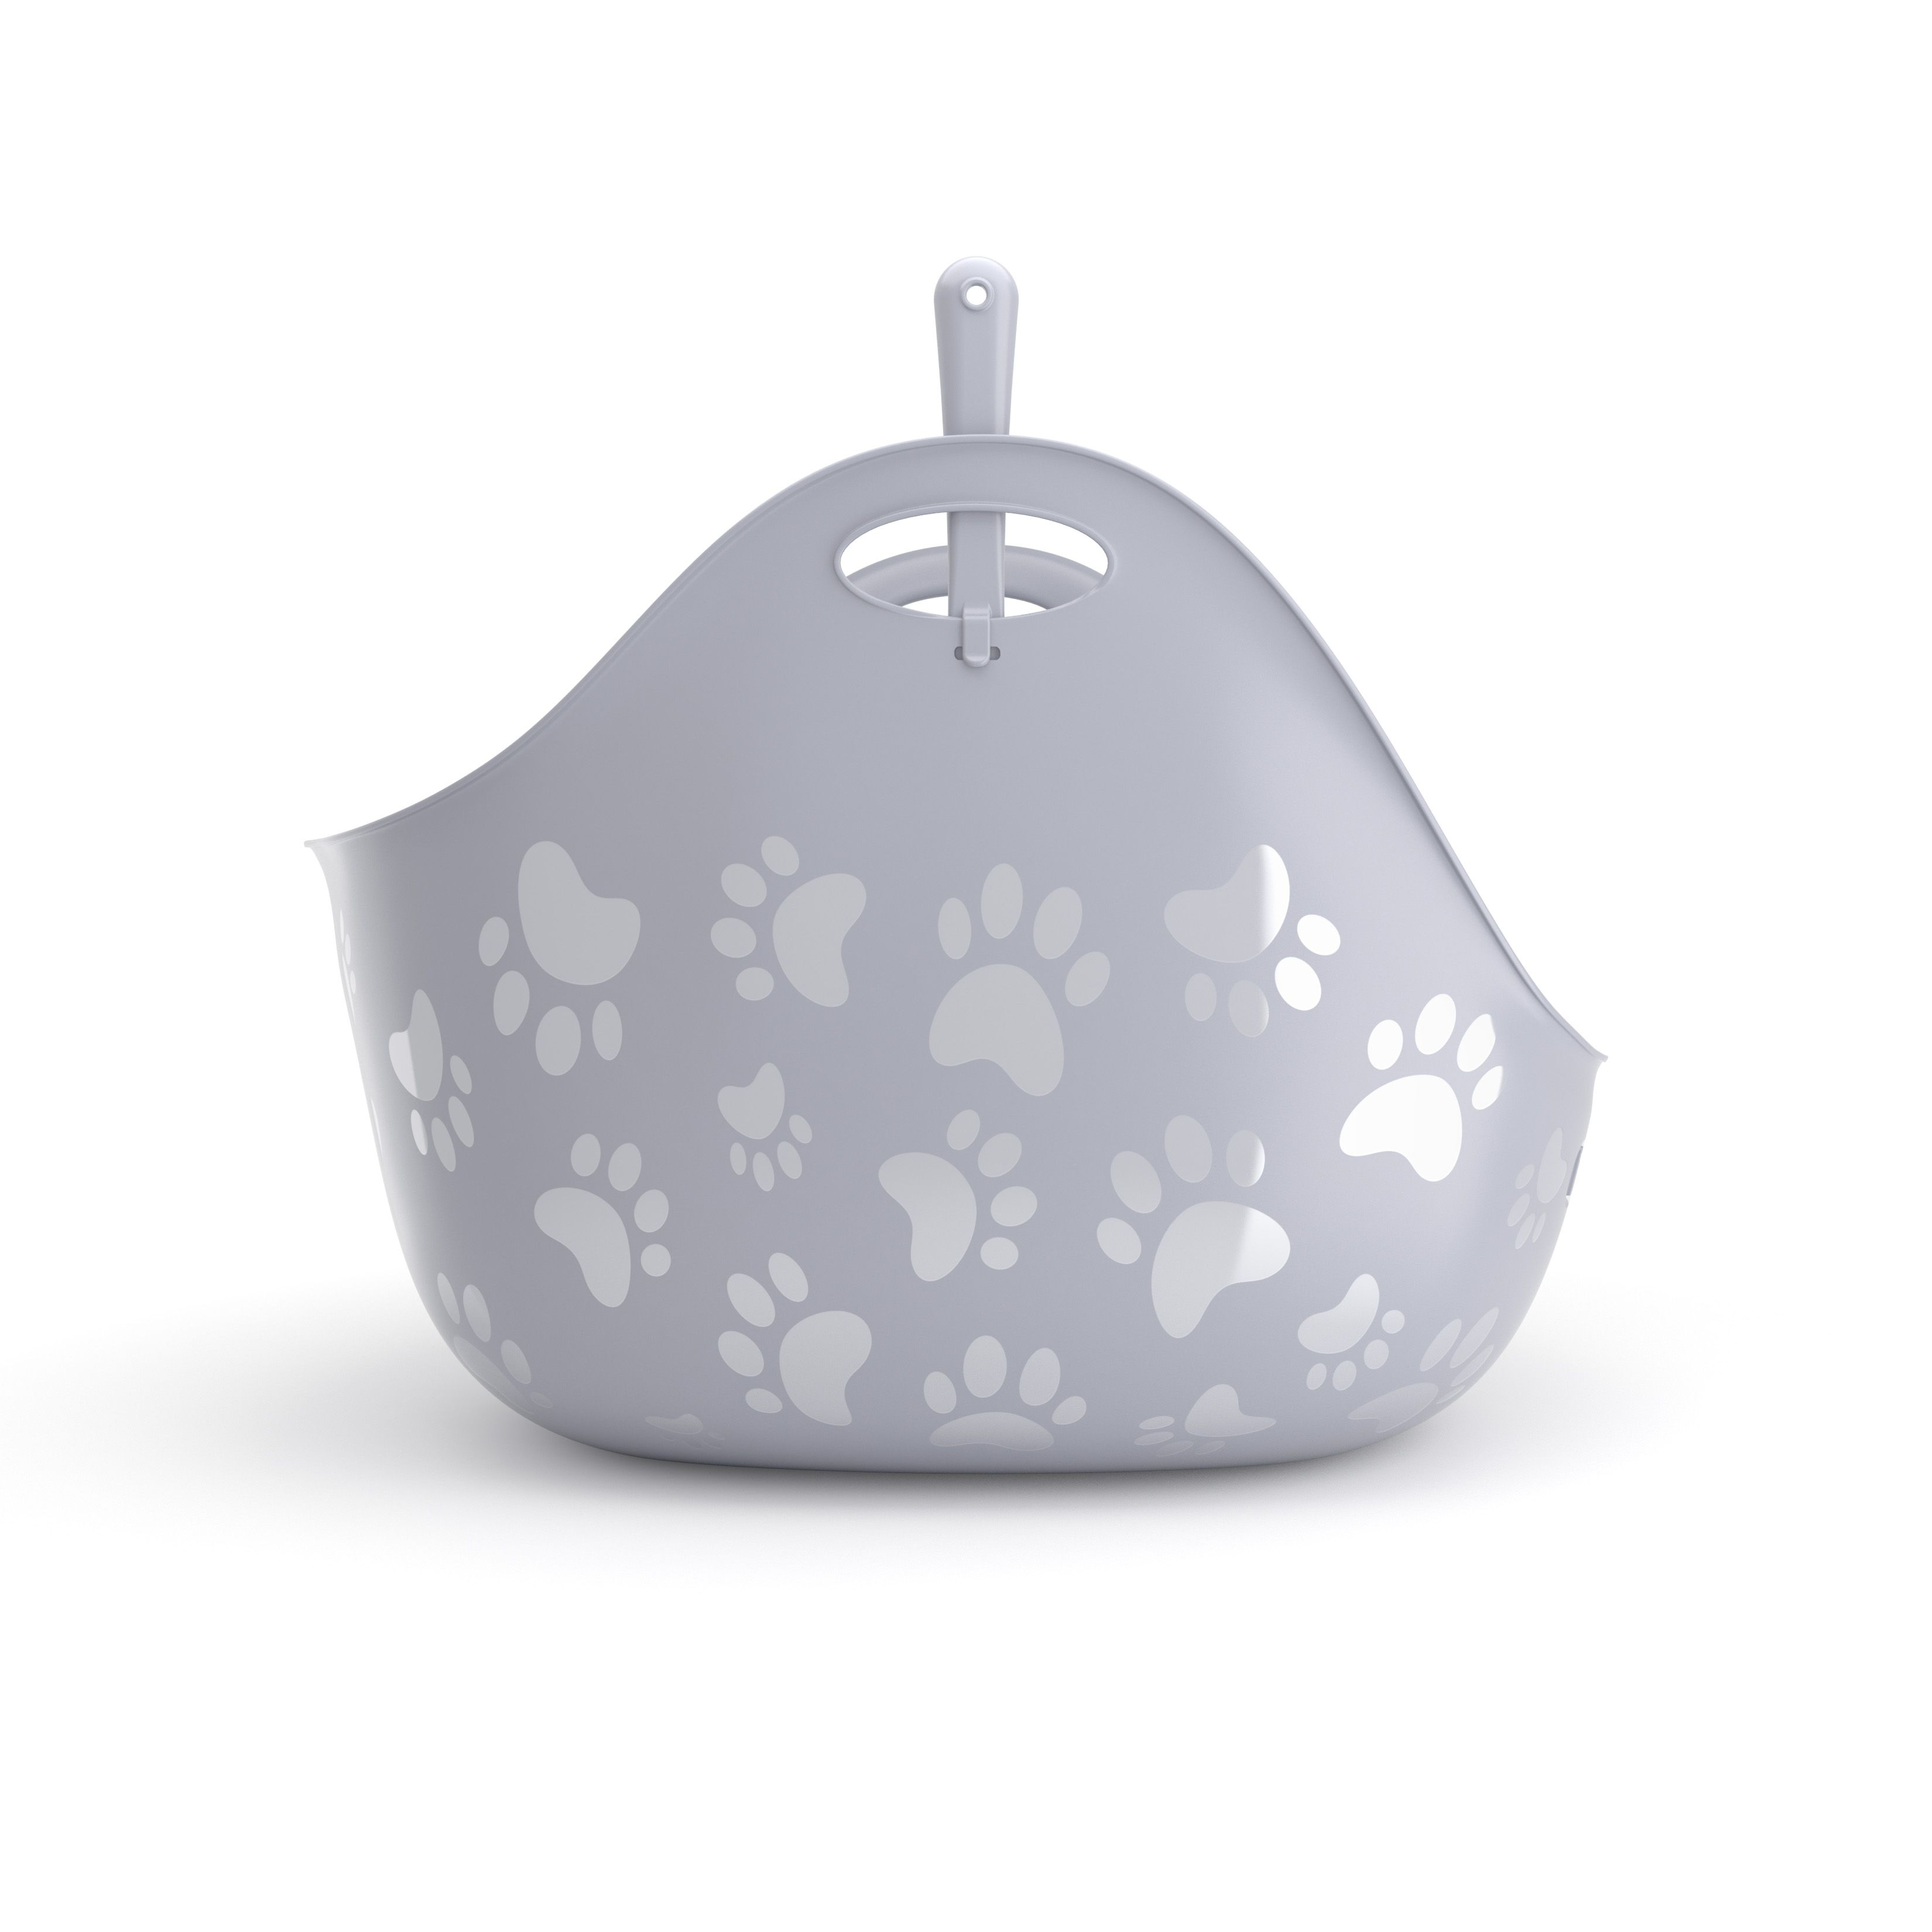 New Litterbox By Litterlocker With Scoop Litterlocker Com Litter Box Cleaning Hacks Cat Litter